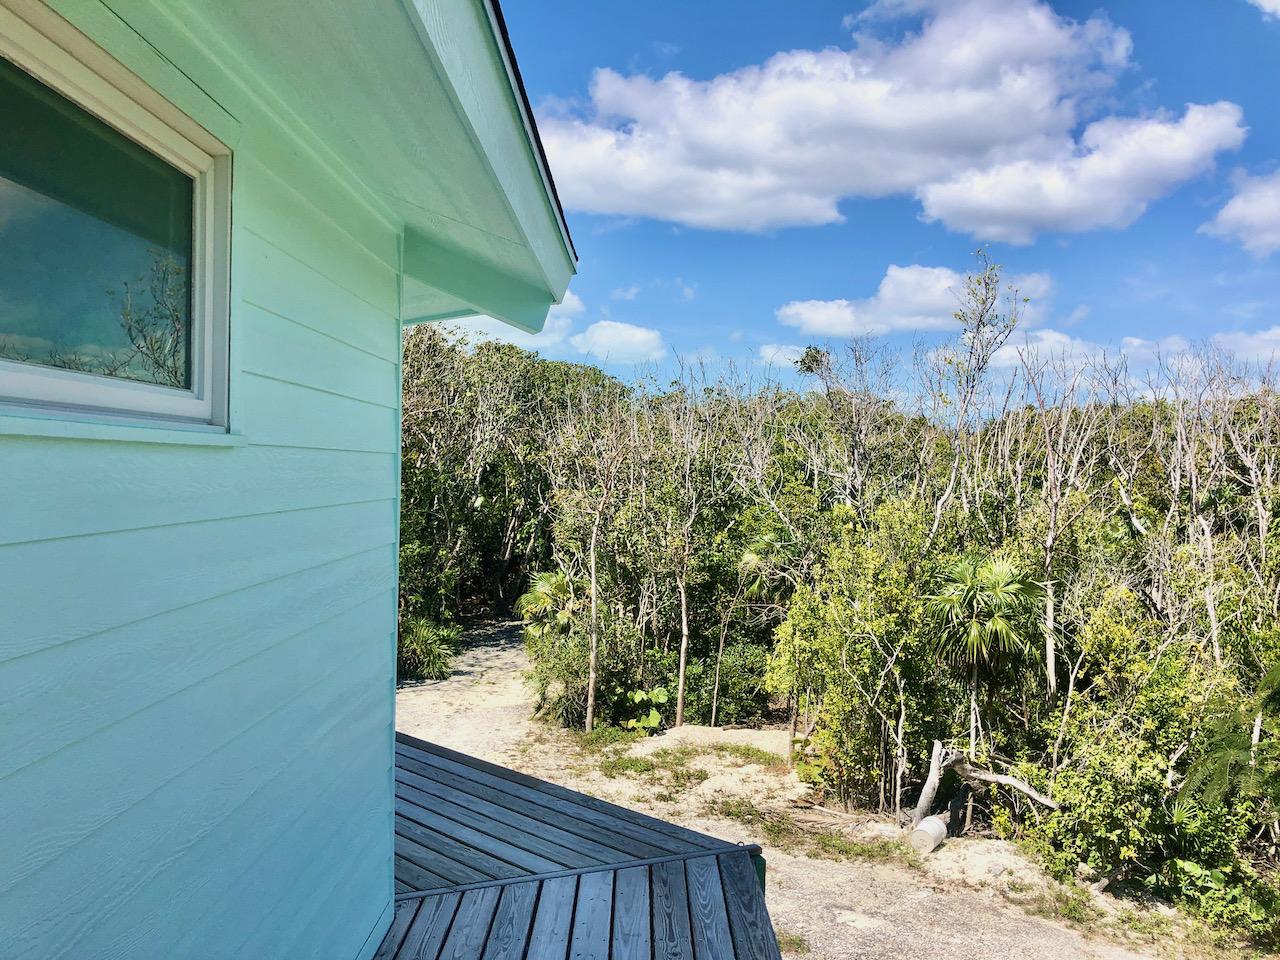 bahama-palm-shores-beachfront-home-for-sale-7